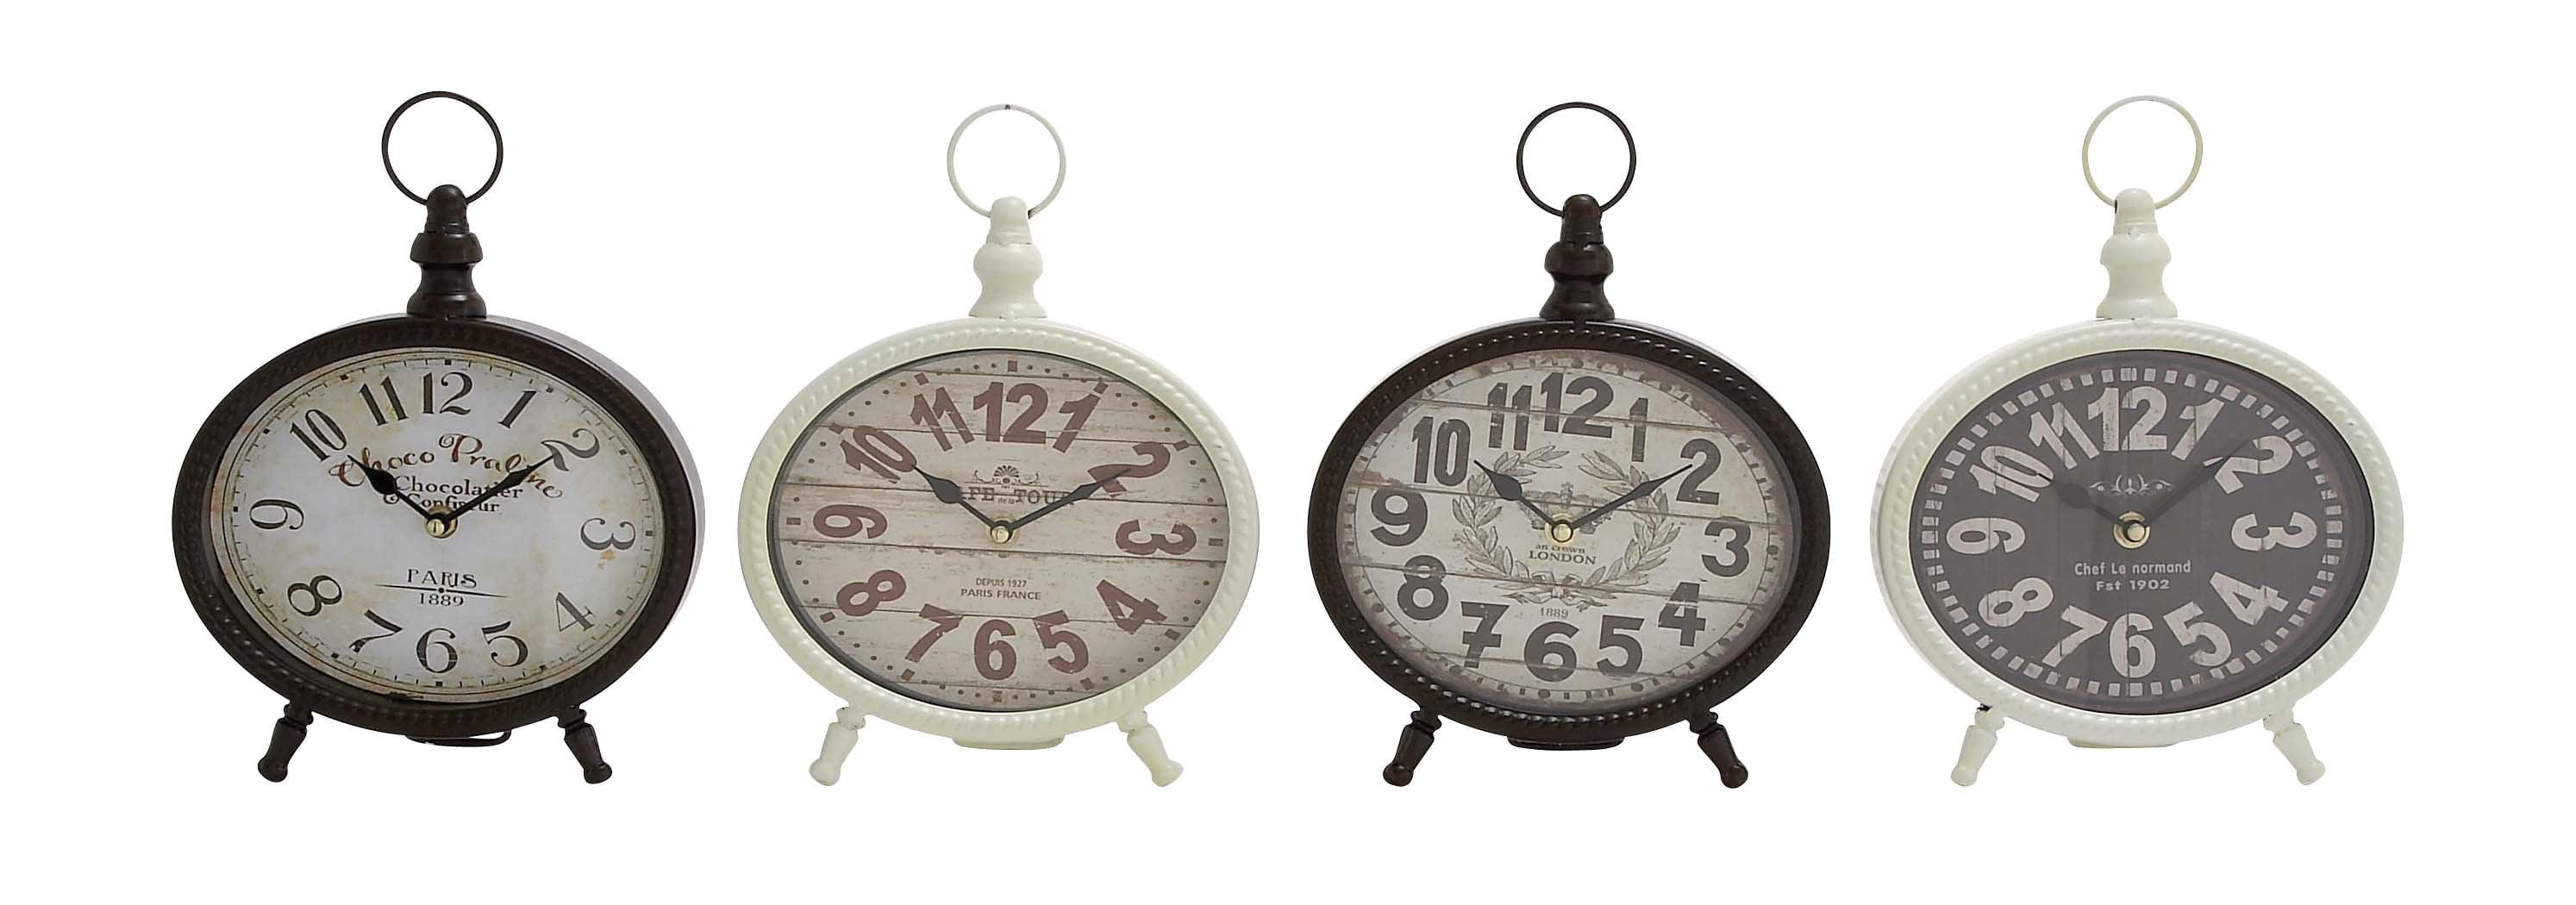 Creative Round Shaped Metal Desk Clock 4 Assorted by Benzara